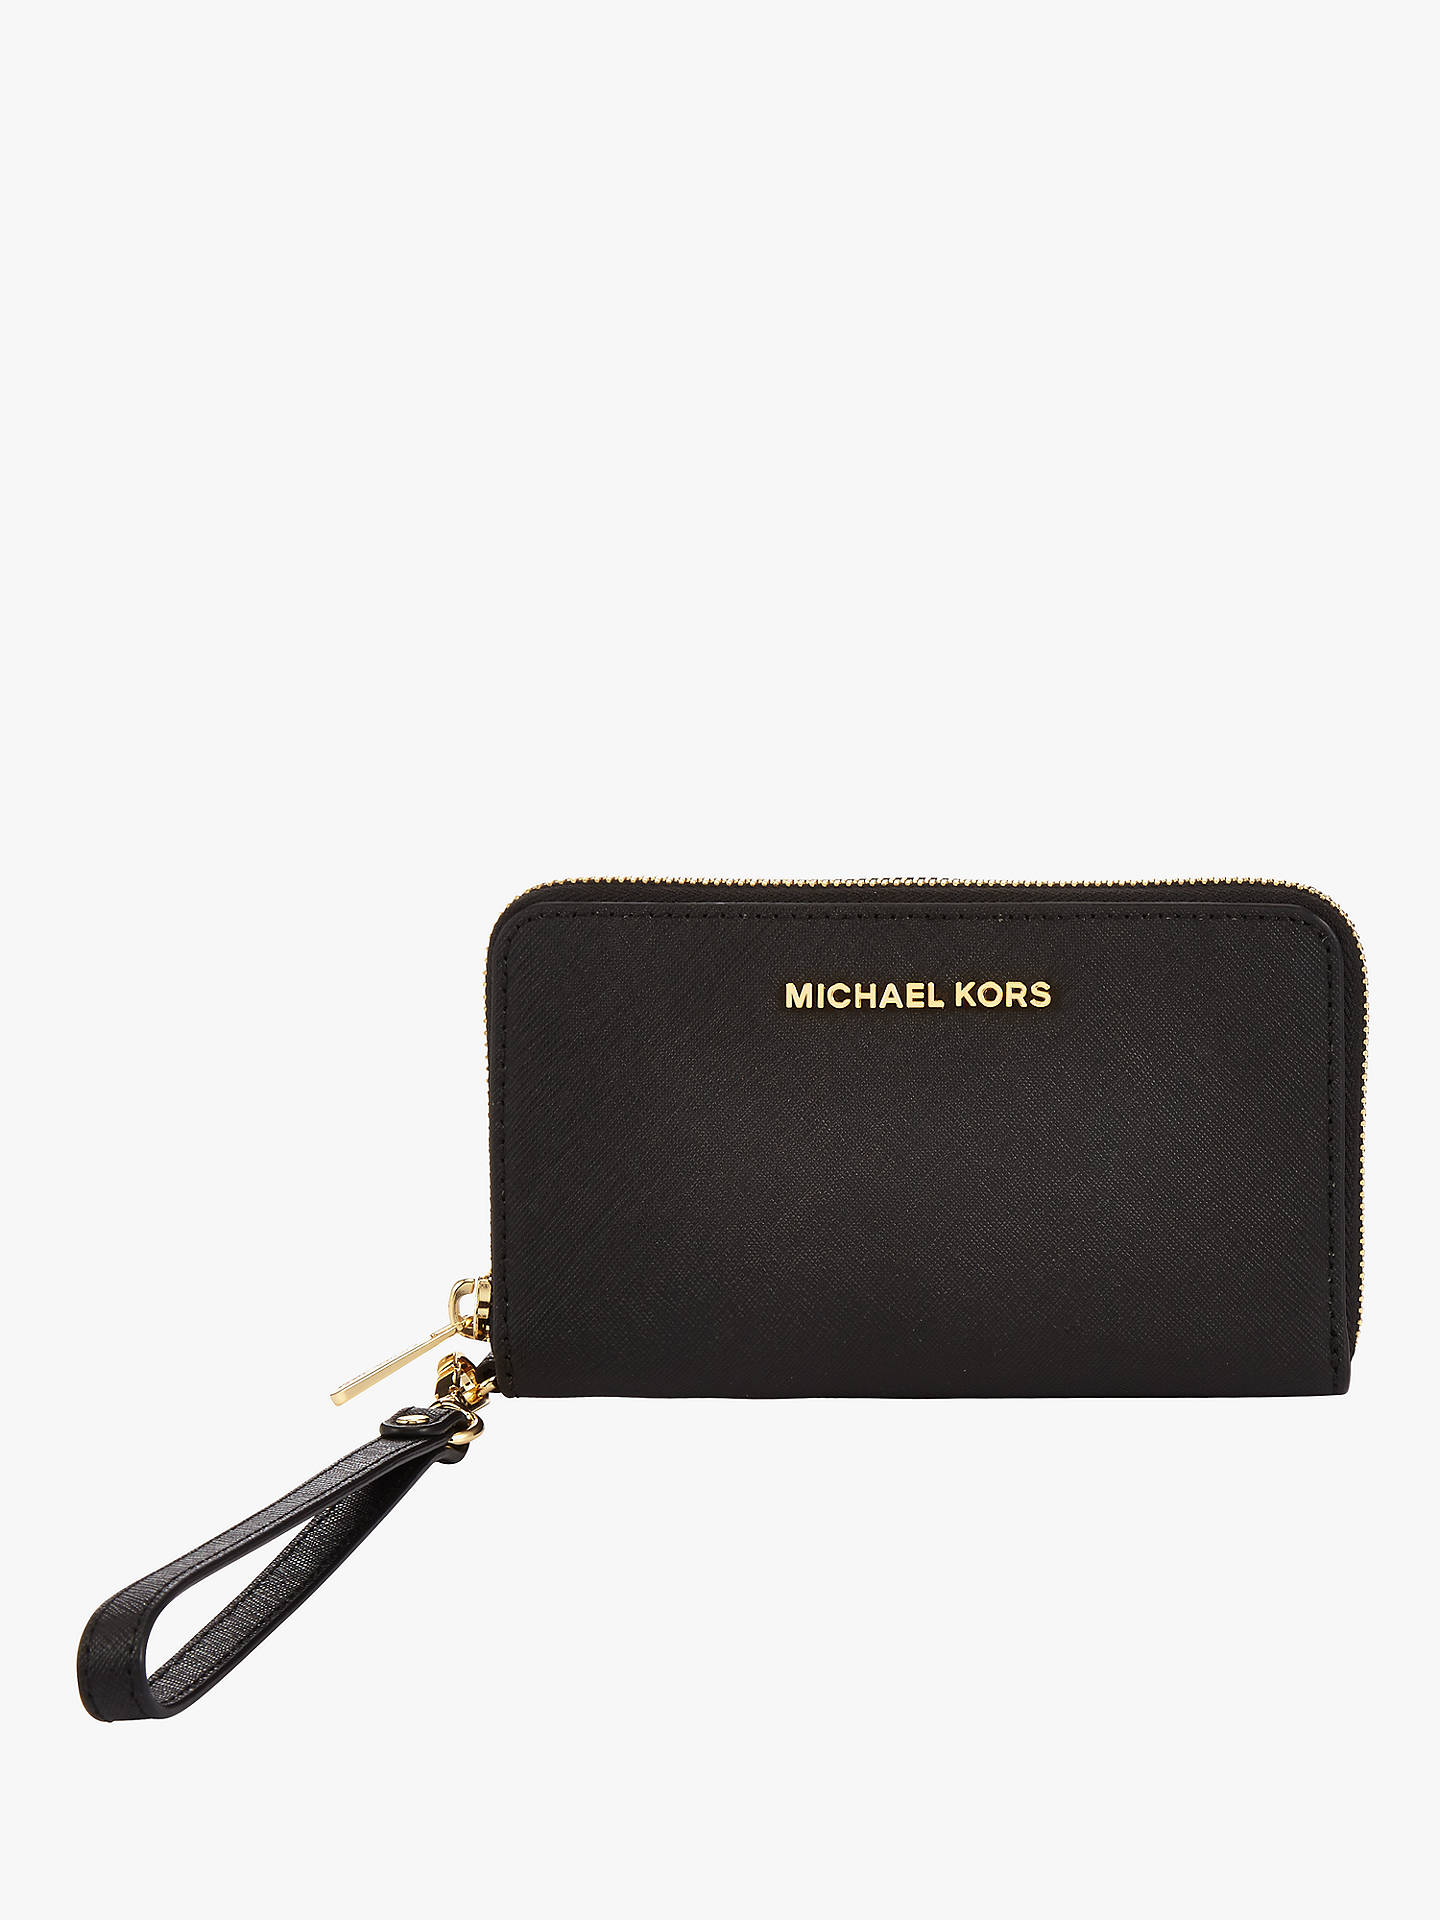 08f786986026 Buy MICHAEL Michael Kors Jet Set Leather Travel iPhone 6 Case Purse, Black  Online at ...